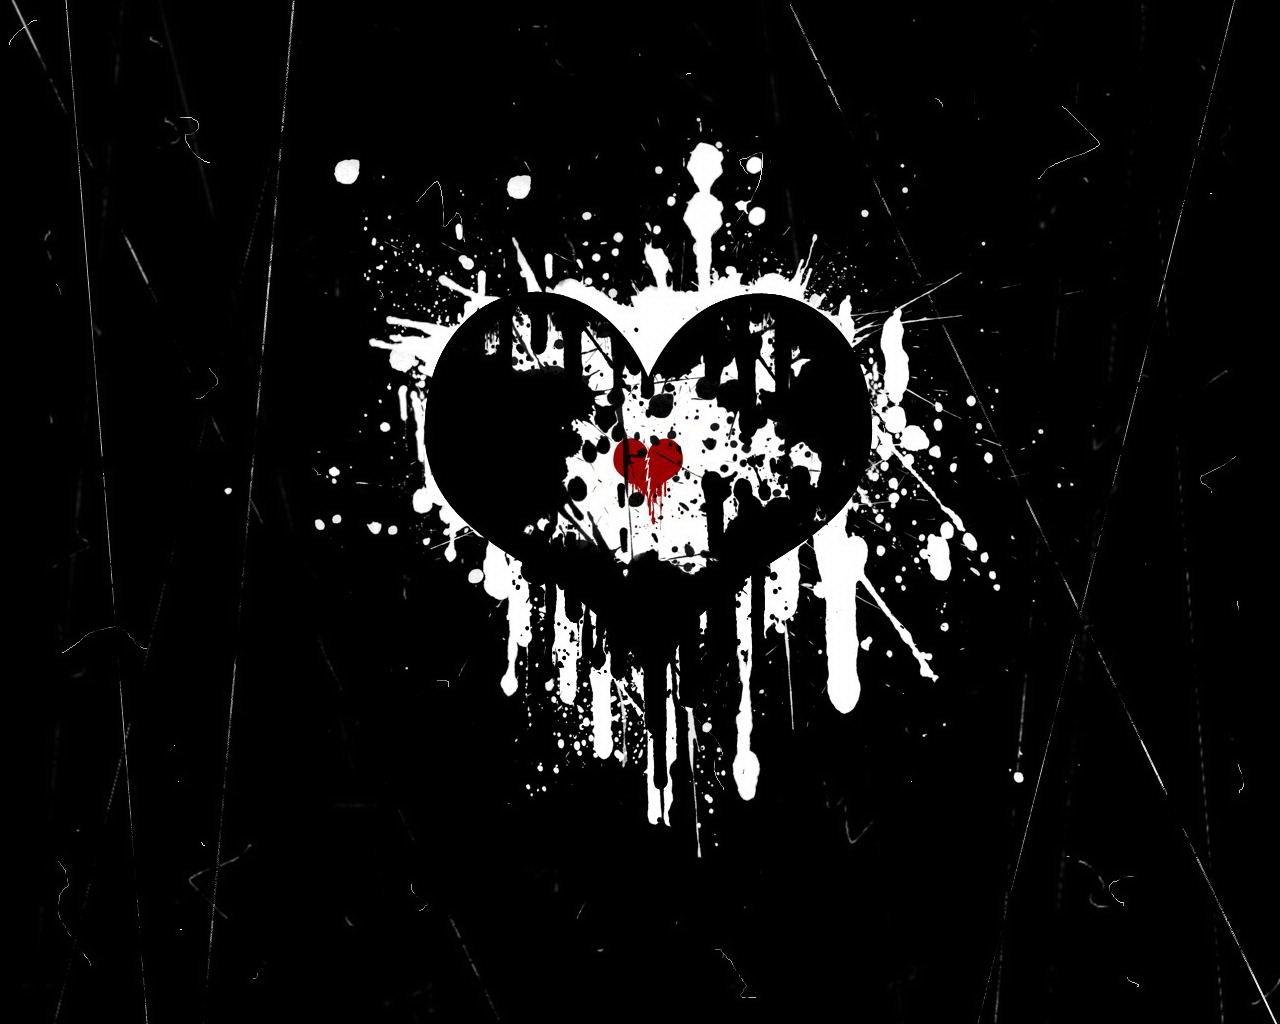 http://4.bp.blogspot.com/-M02cVSmgXLc/TwC3HTM-DvI/AAAAAAAAA_0/PMeJ0GTnmA8/s1600/emo_broken_heart-1280x1024.jpg